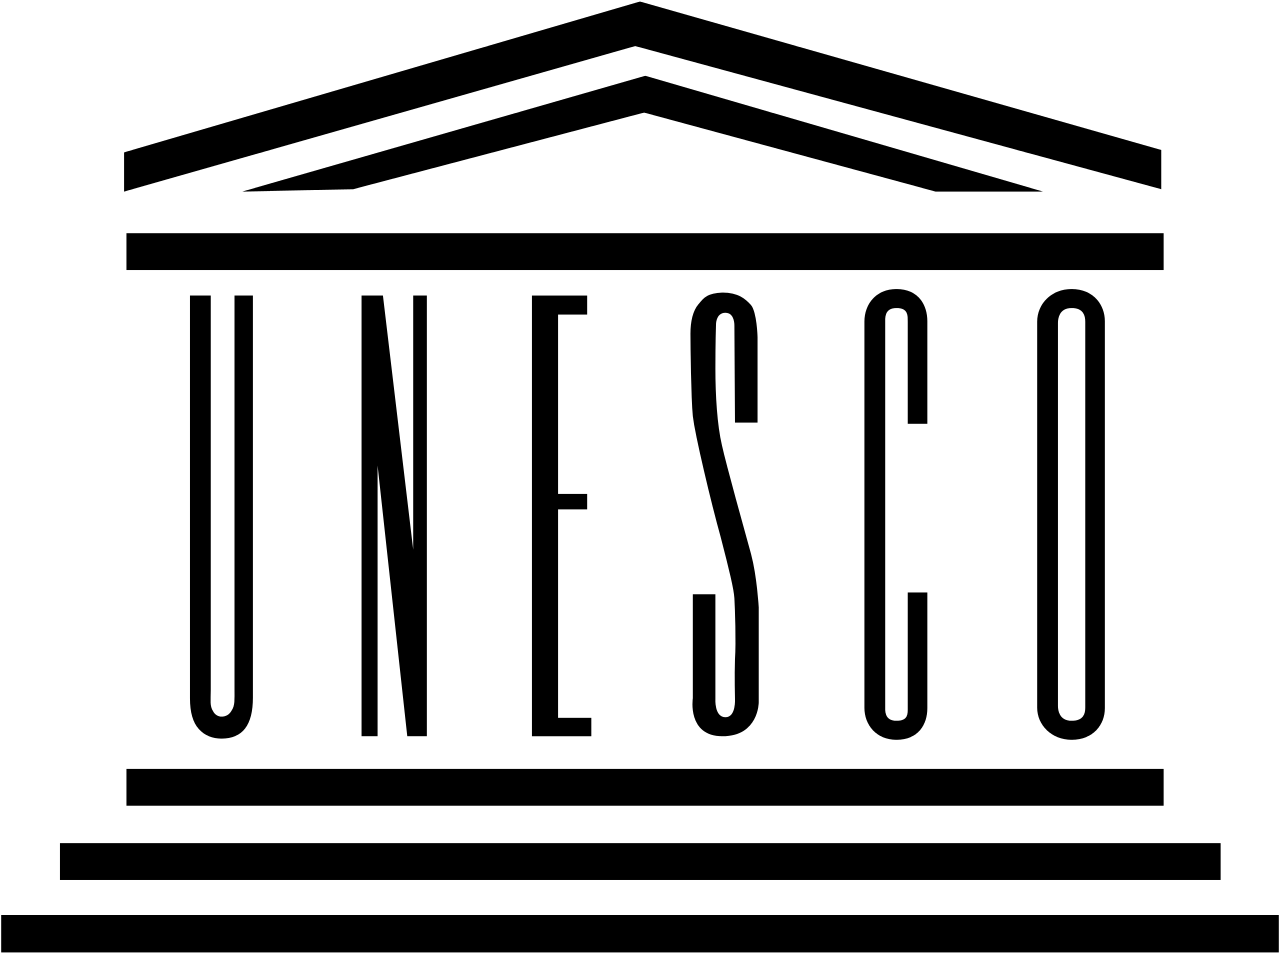 UNESCO_logo 1.png